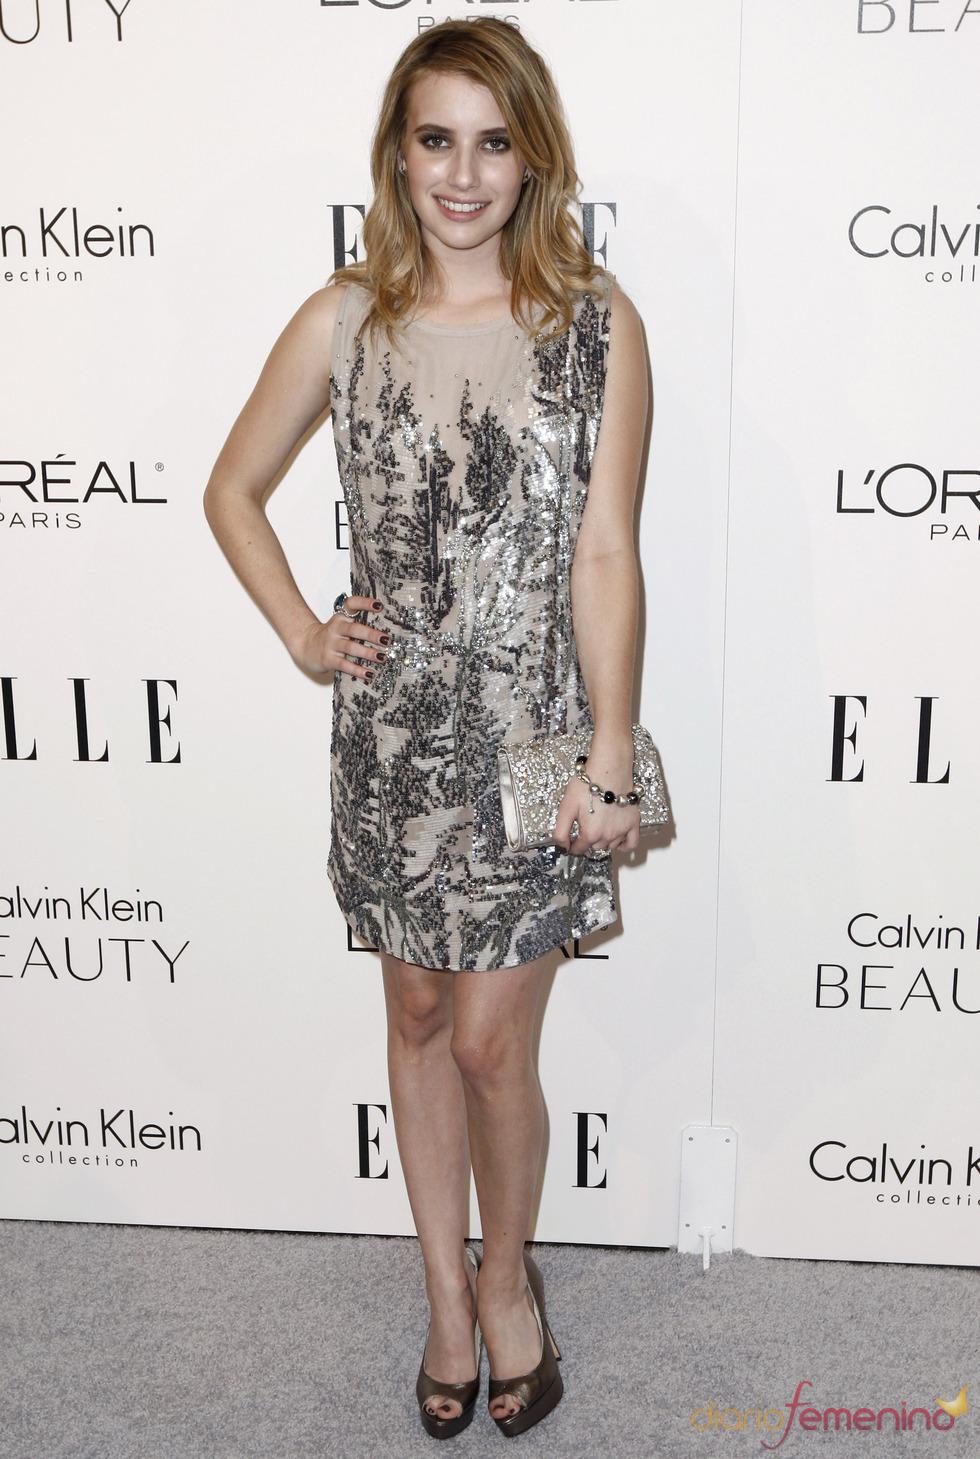 Fiesta Elle 2010: Emma Roberts